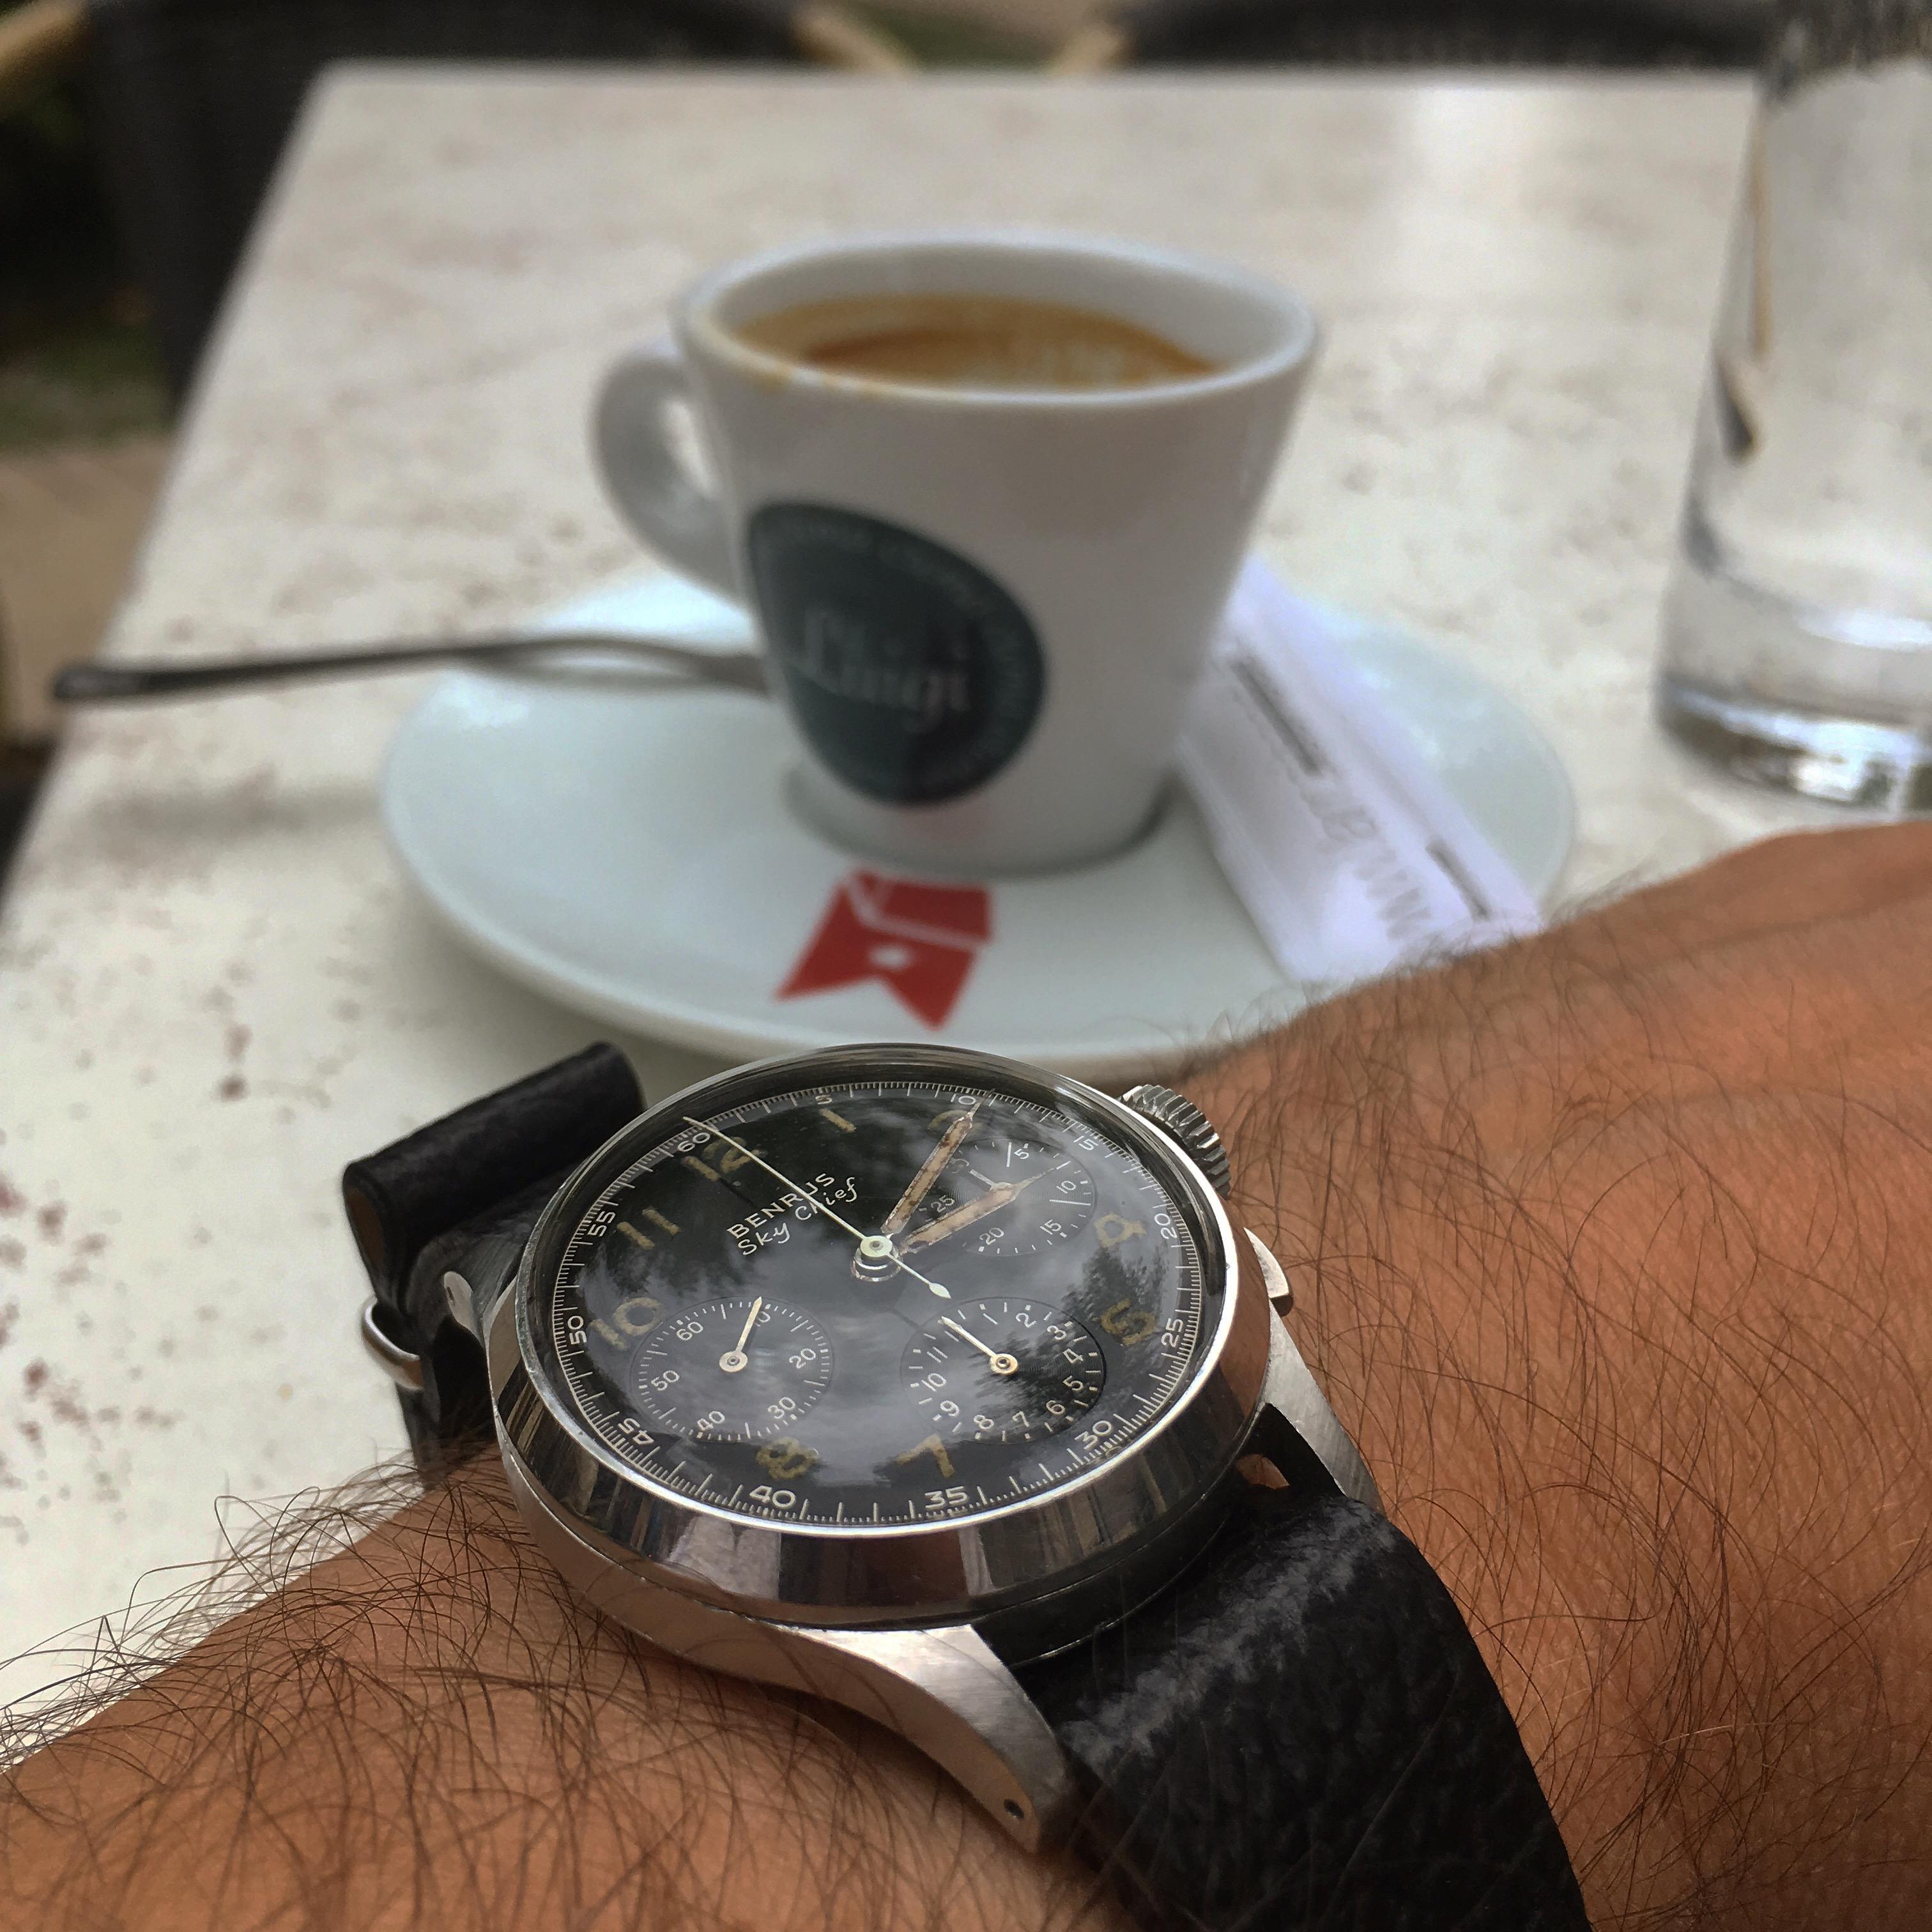 Pause café et montre (toutes marques) - tome III - Page 5 491a3e53-fca9-4b92-970f-cac1b581e68b-jpeg